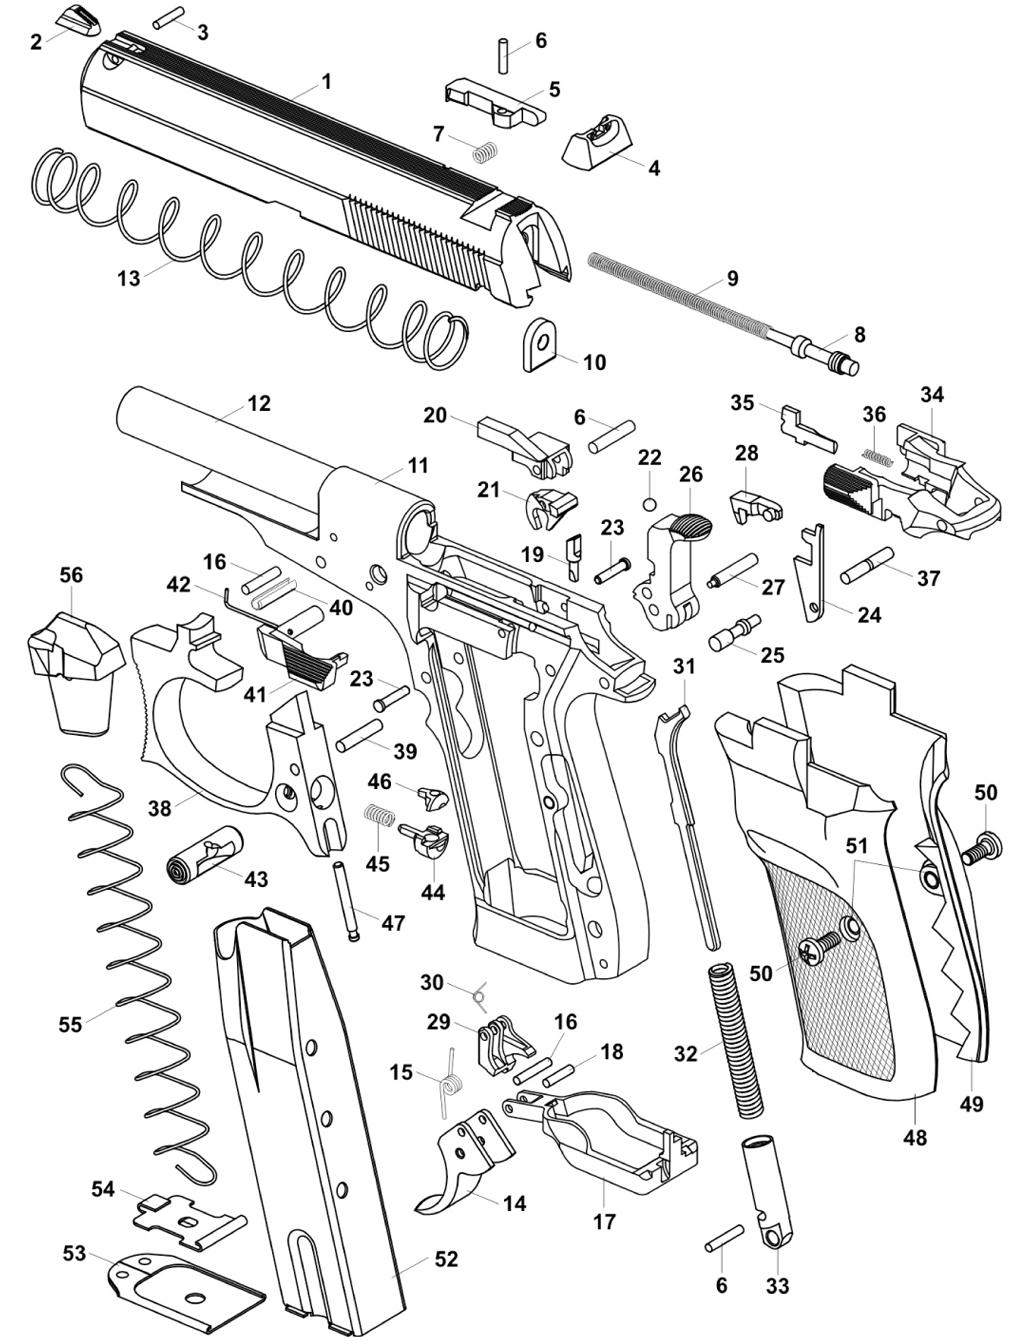 Spare parts cz 83 jizni cz accessories click here for diagram pooptronica Images